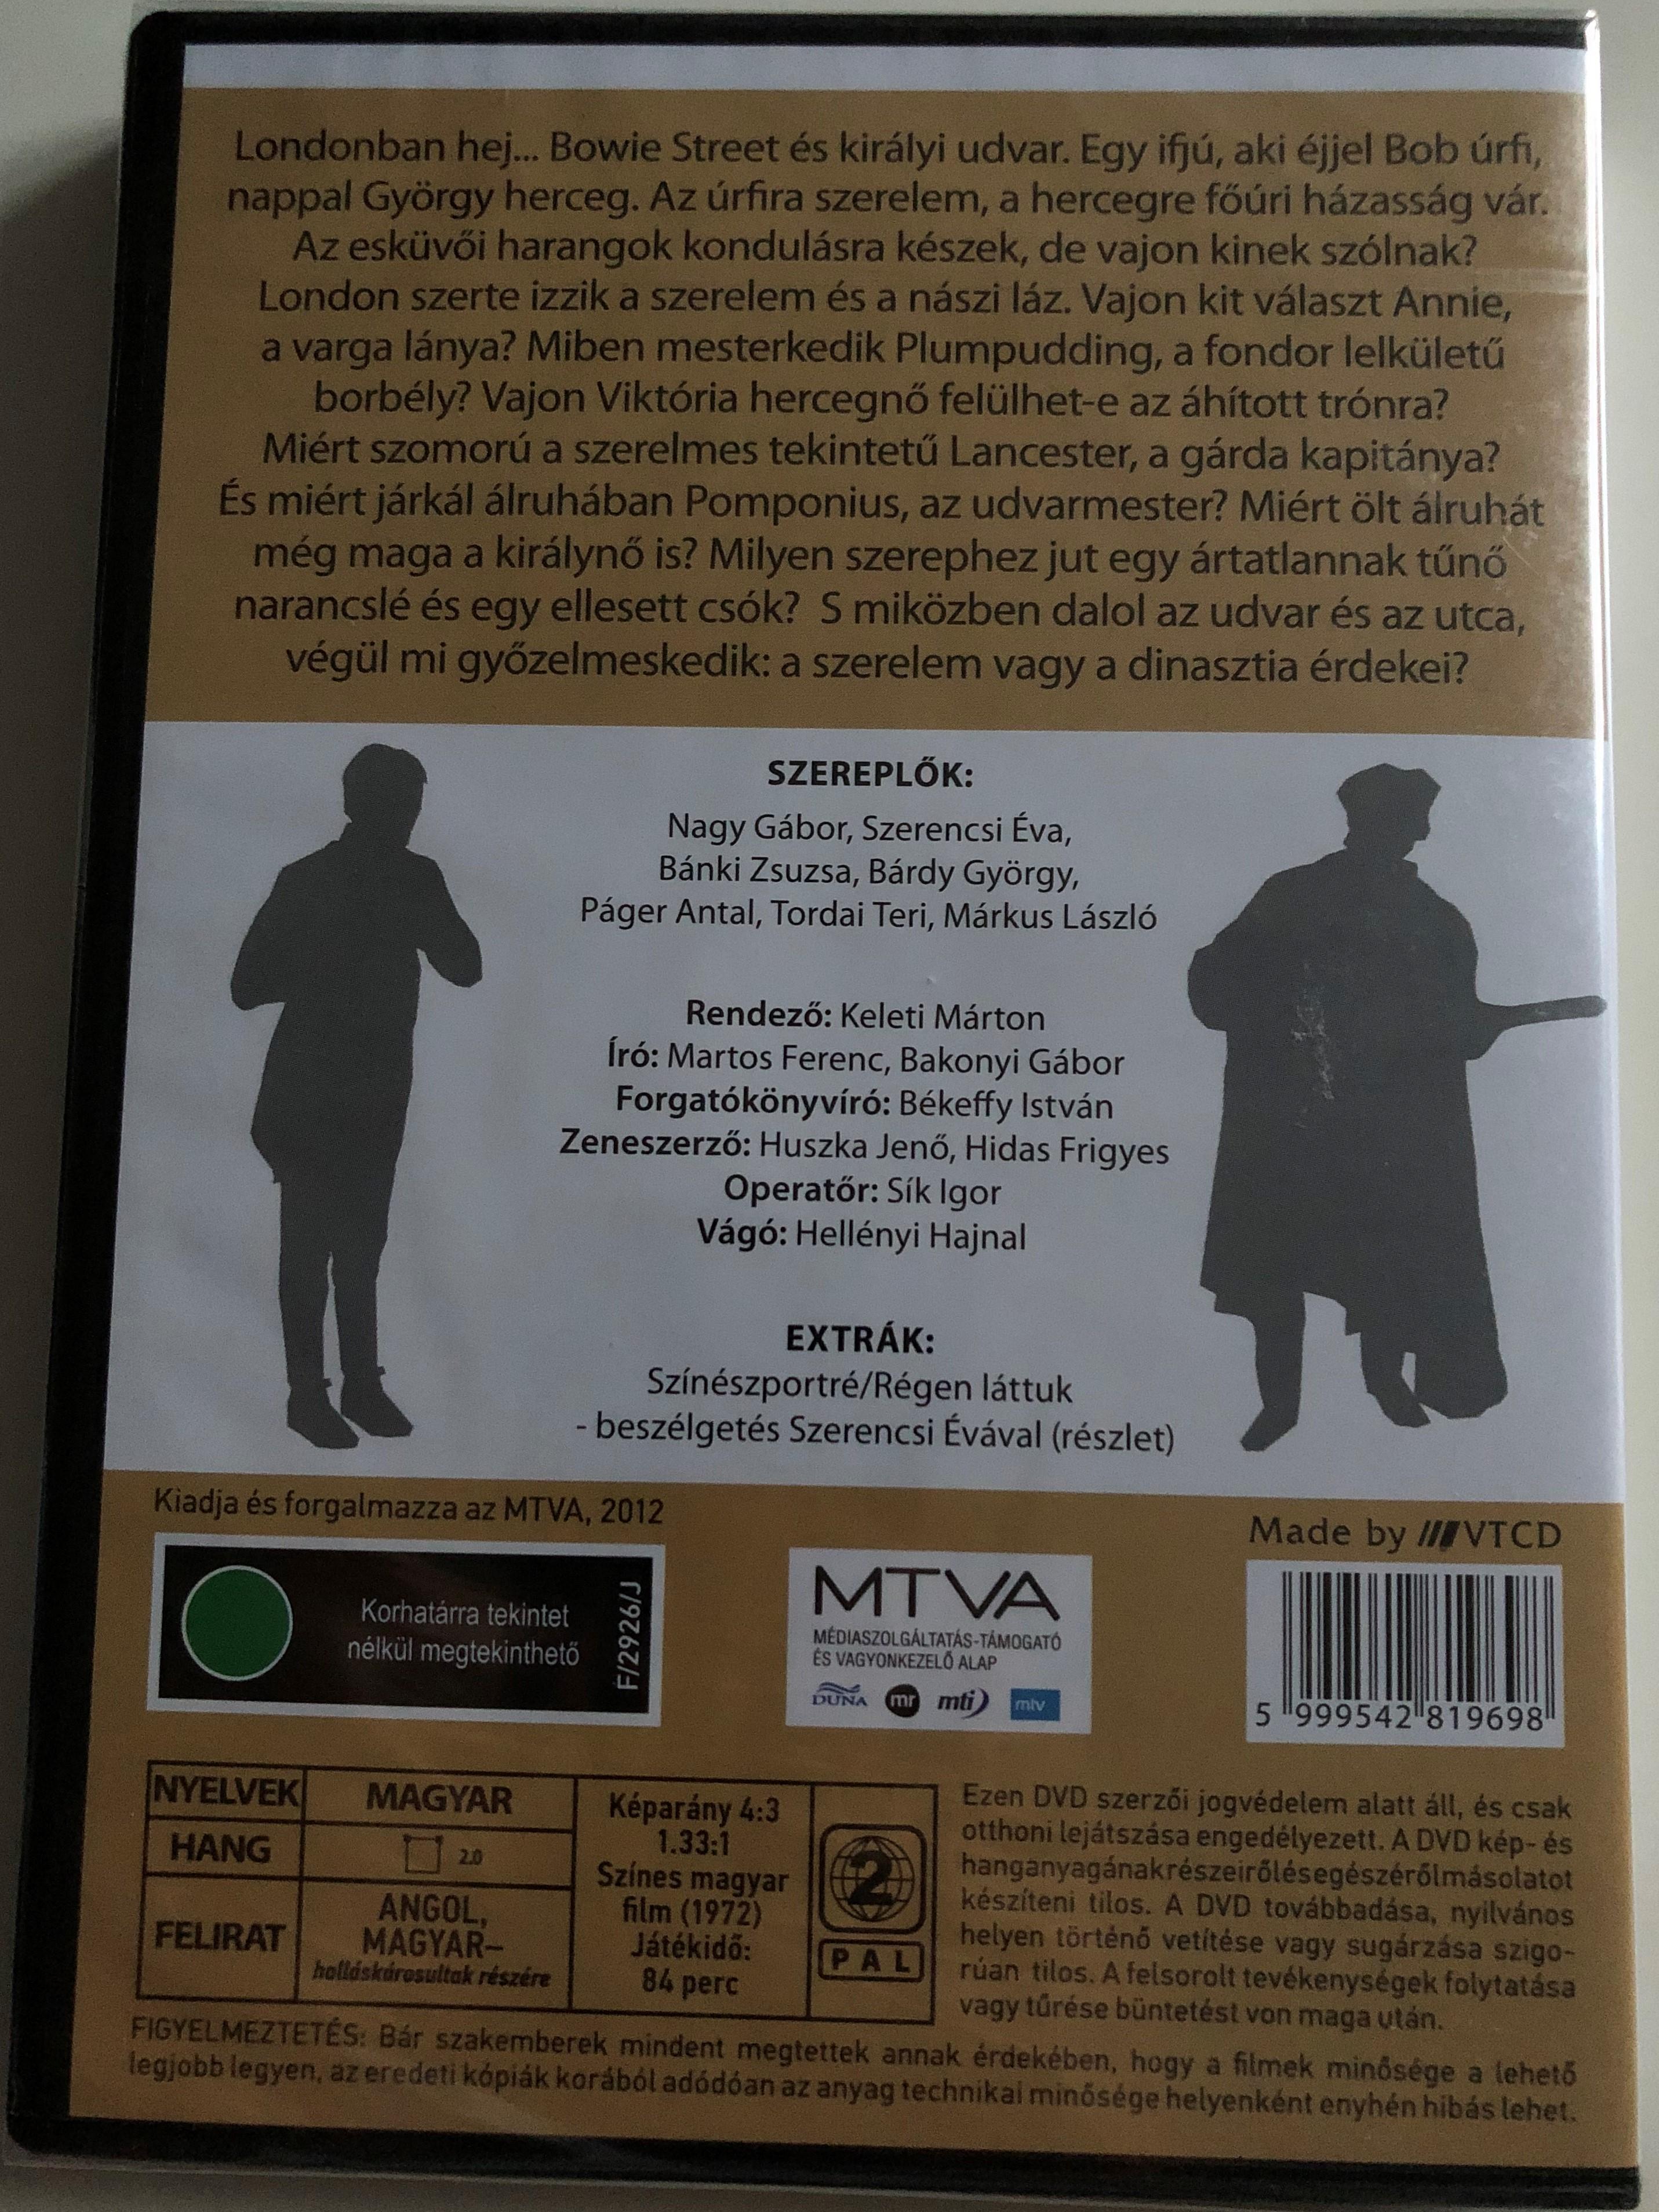 -prince-bob-dvd-1972-bob-herceg-hungarian-operetta-directed-by-keleti-m-rton-starring-nagy-g-bor-szerencsi-va-b-nki-zsuzsa-b-rdi-gy-rgy-tordai-teri-2-.jpg